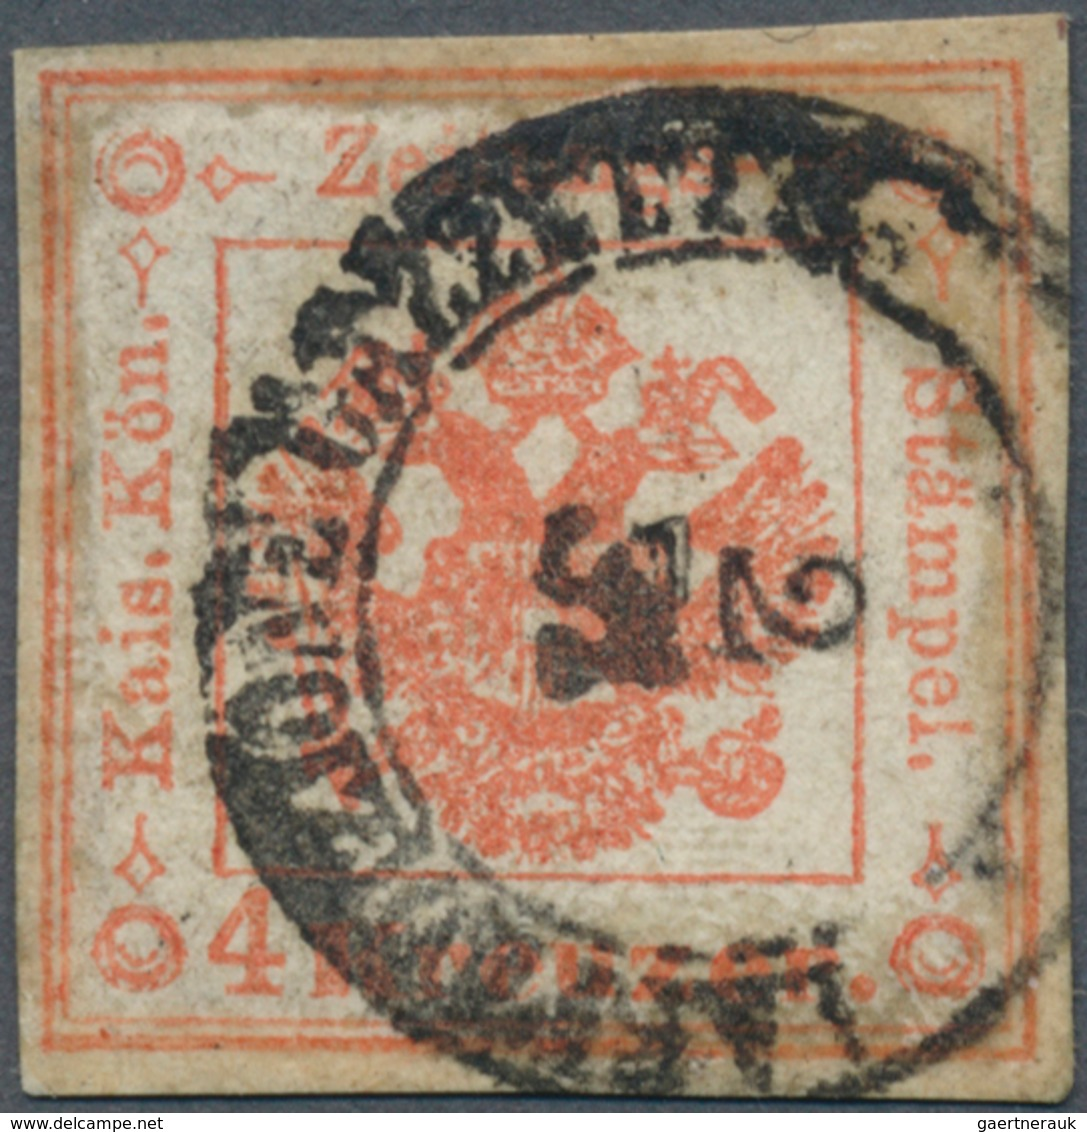 Österreich - Lombardei Und Venetien - Zeitungsstempelmarken: 1858, 4 Kreuzer Rot, Gestempelt I.R.SPE - Lombardy-Venetia